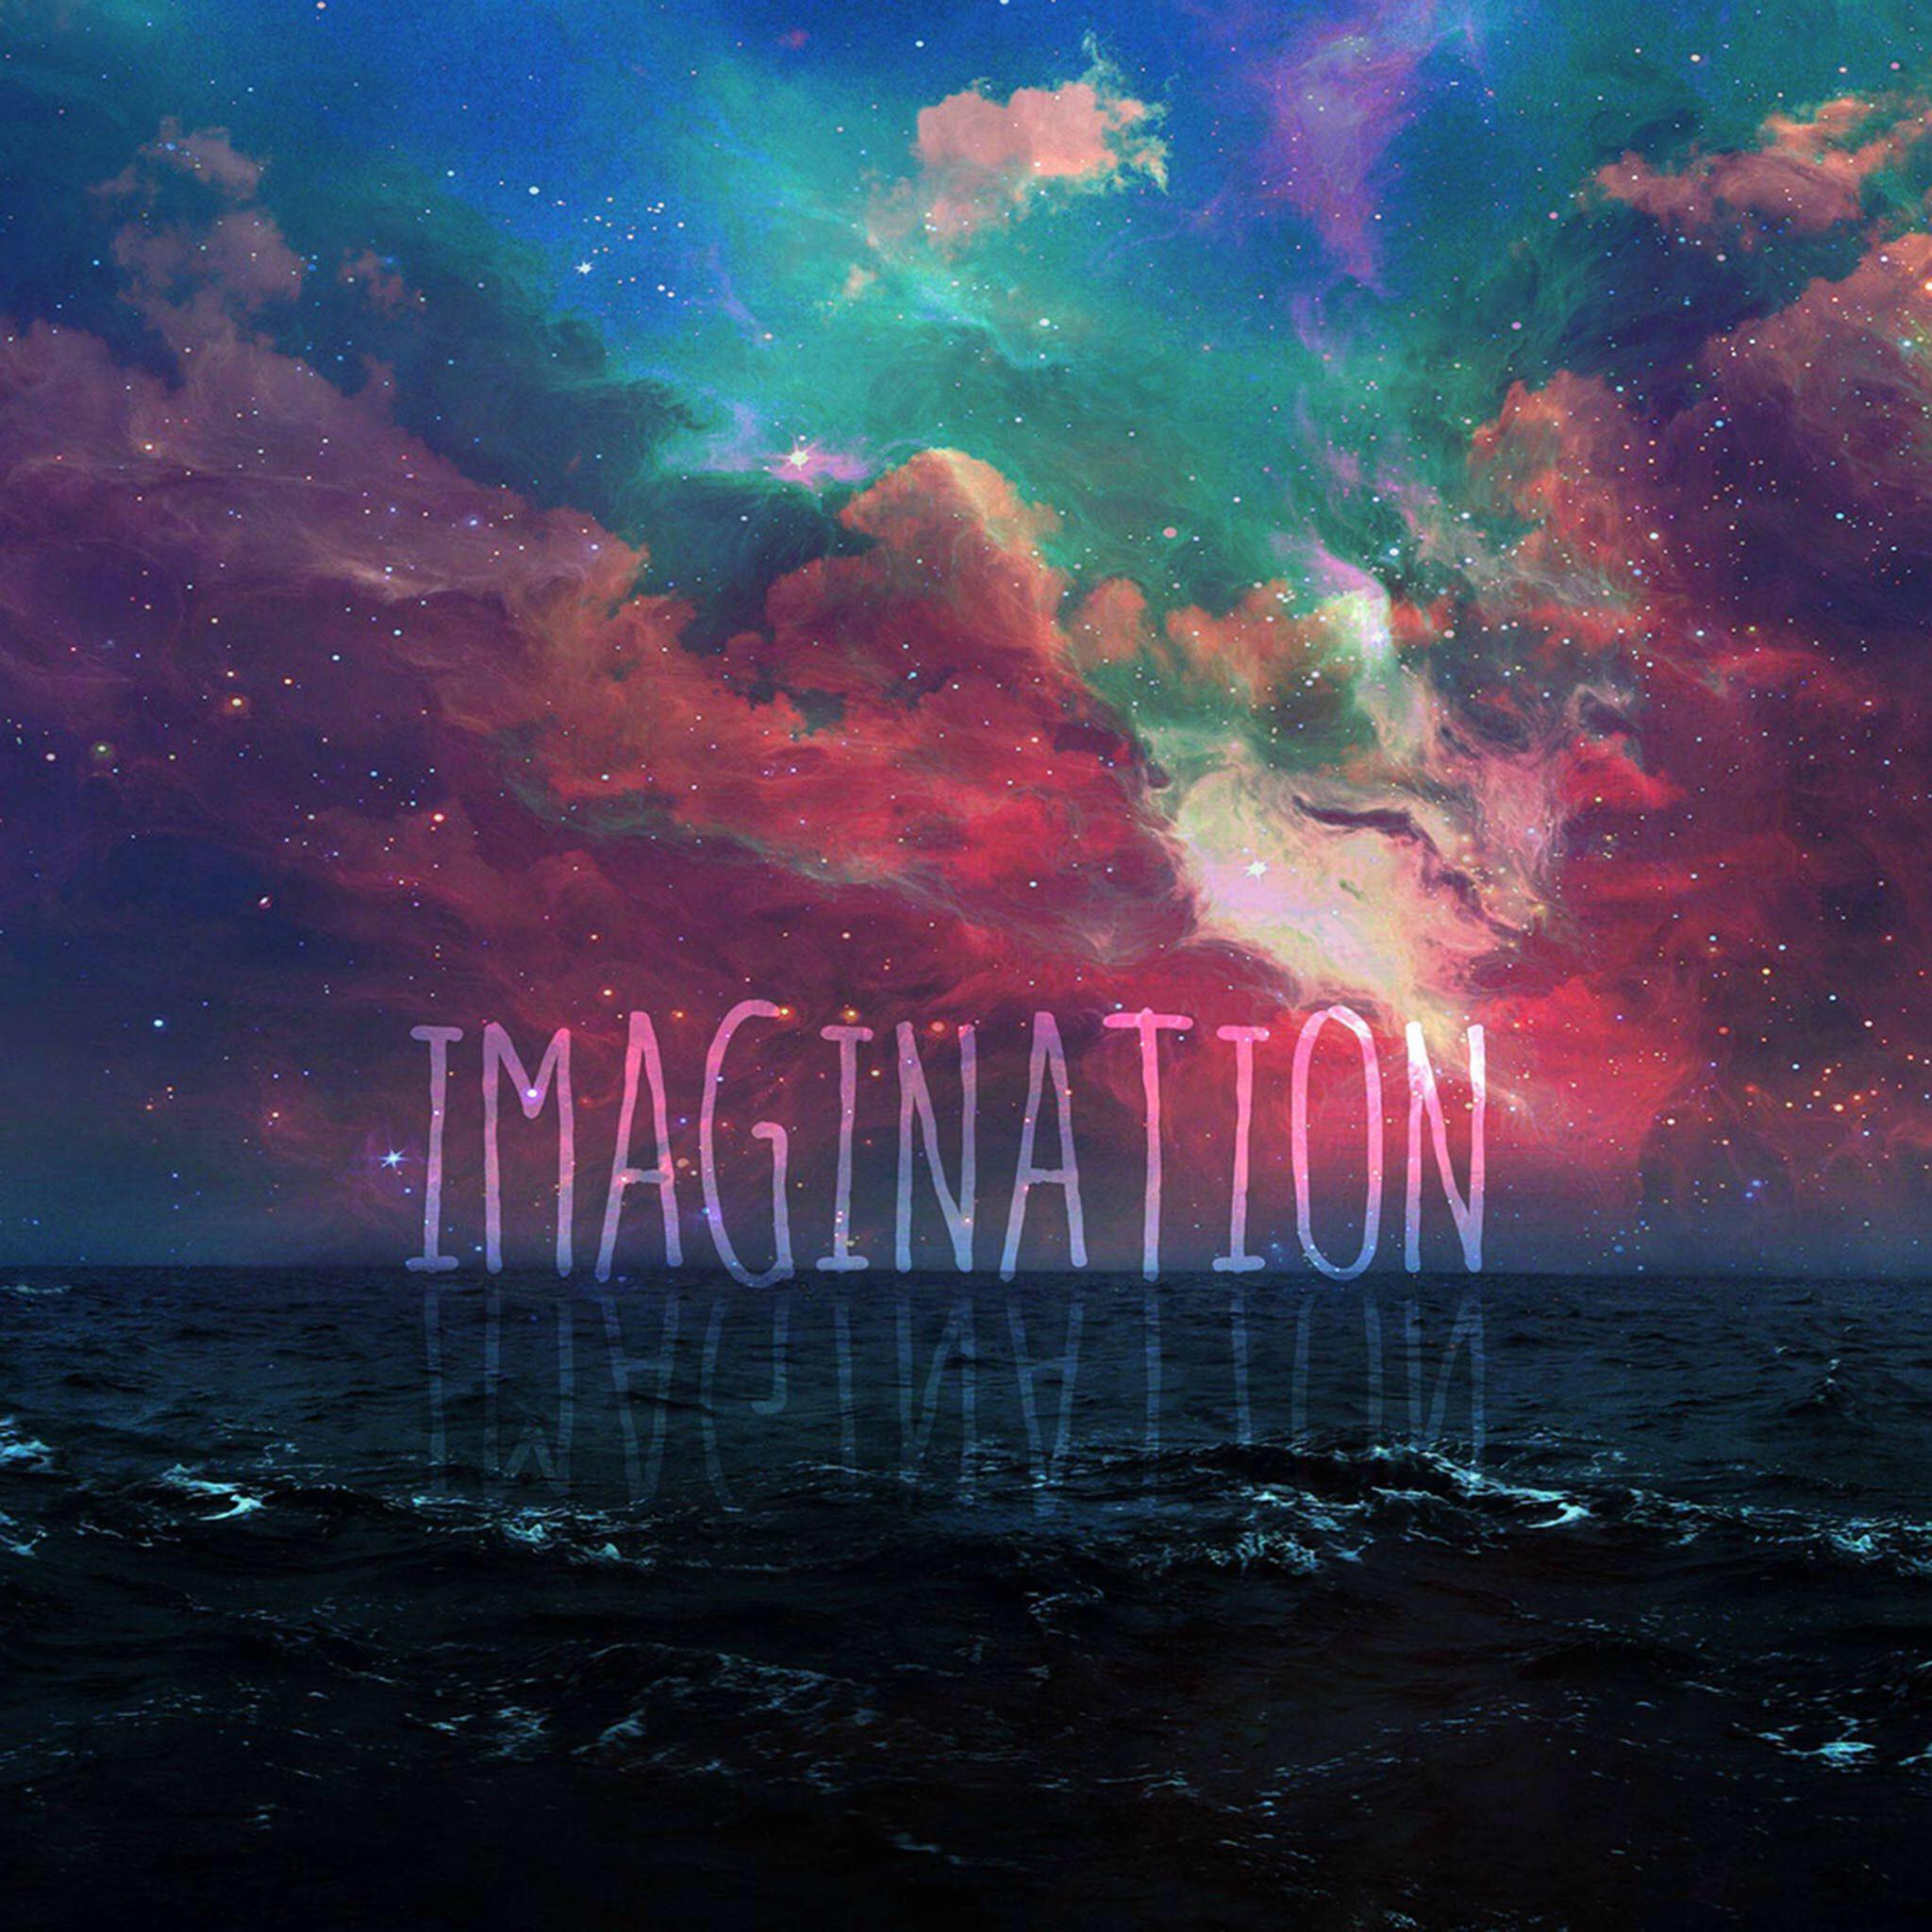 Imagination Galaxy wallpaper ✌️